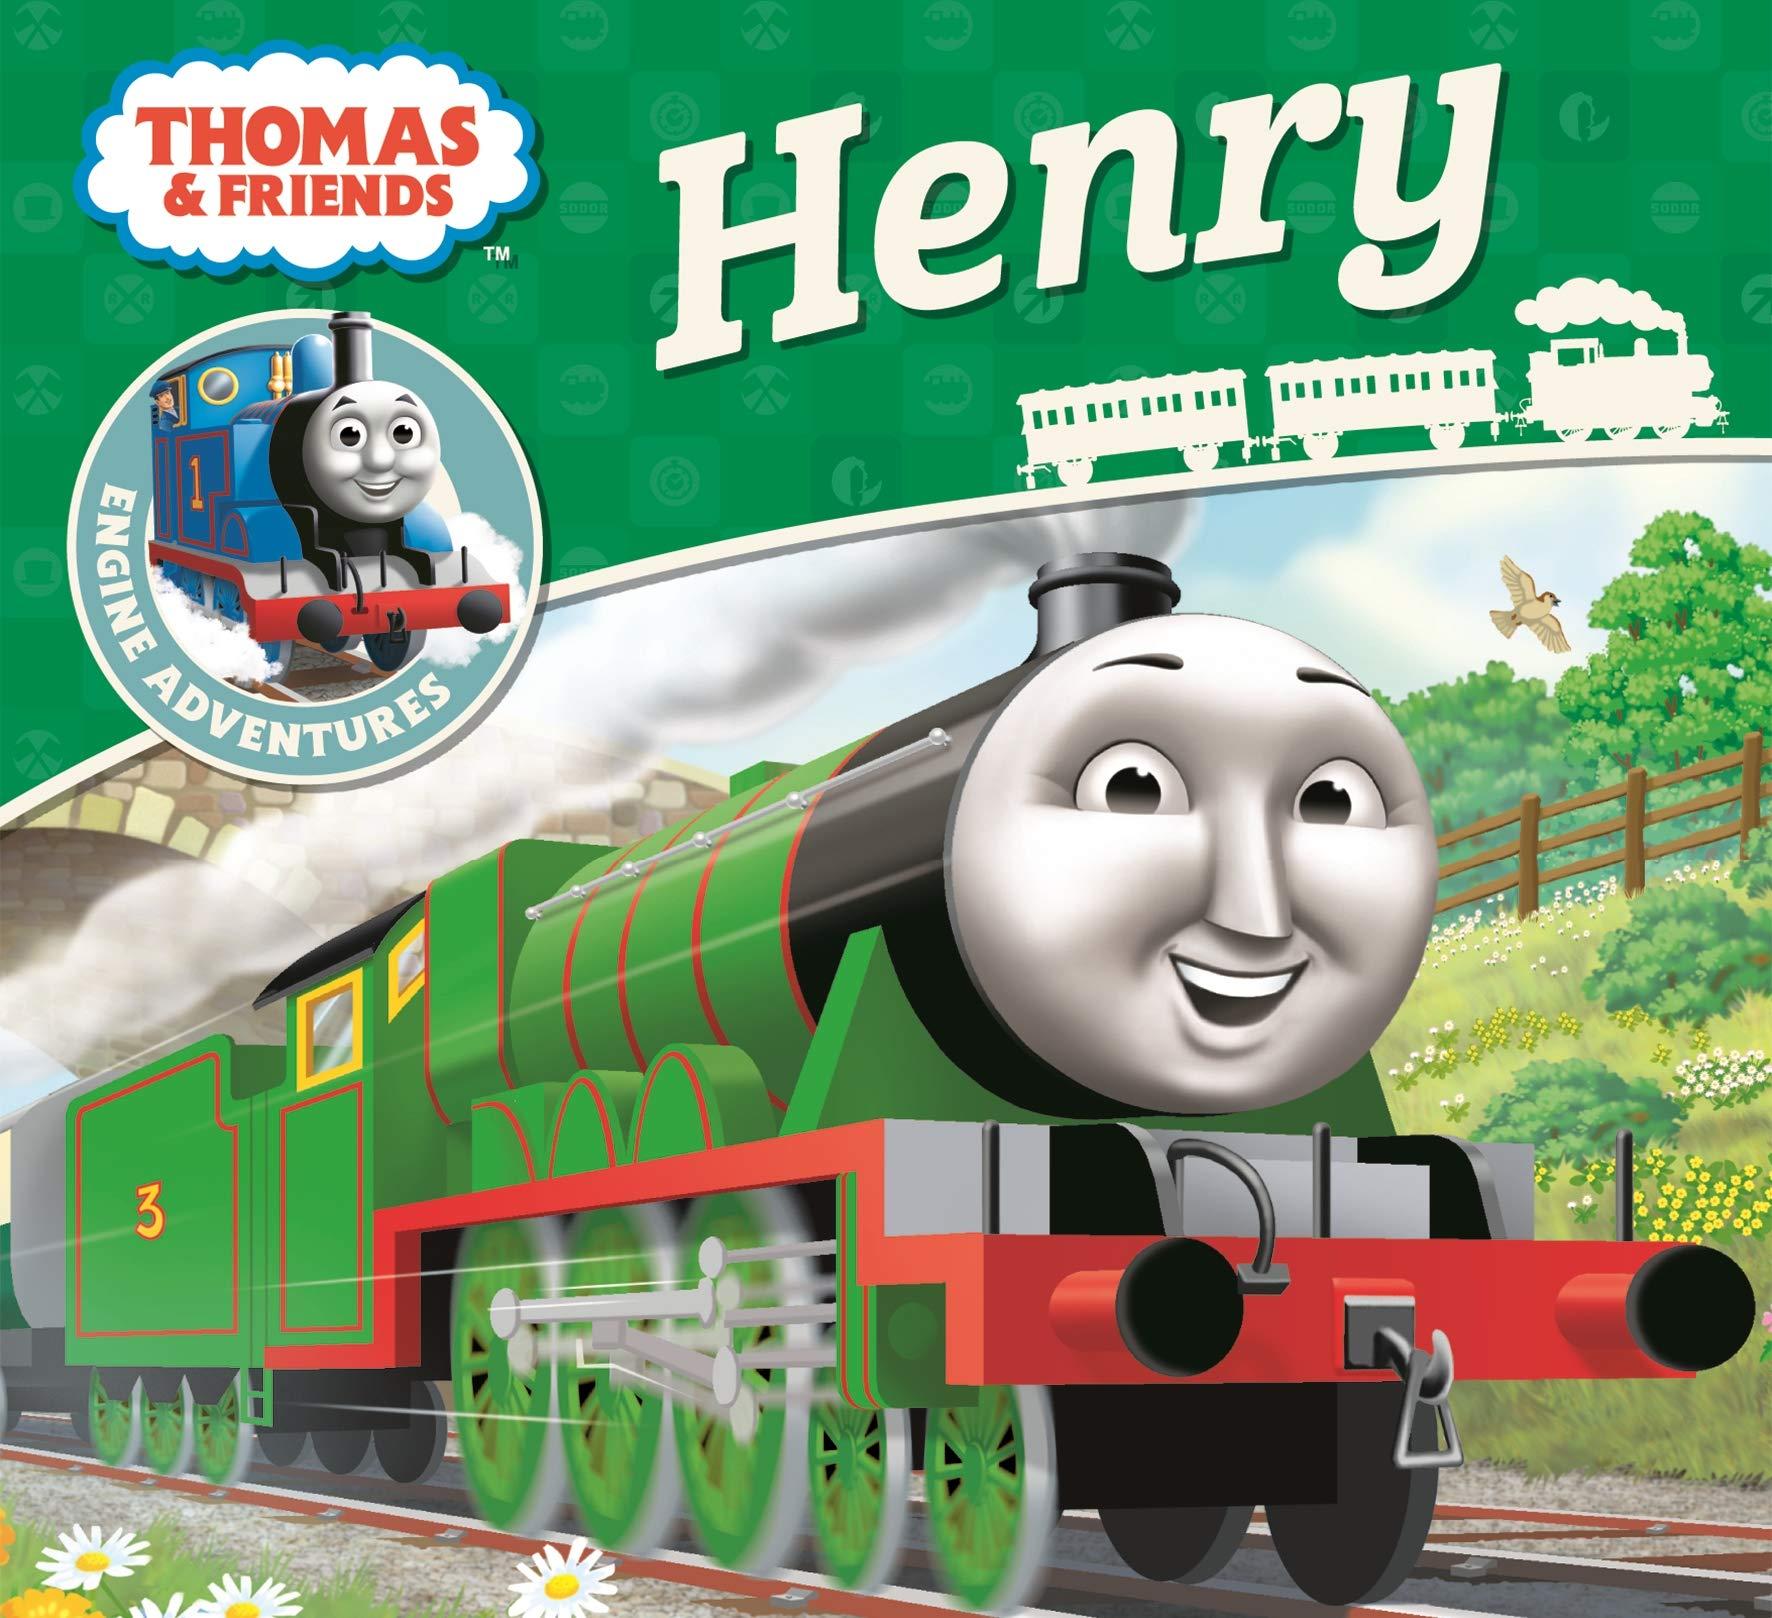 Thomas Friends Henry Thomas Engine Adventures 9781405279772 Amazon Com Books